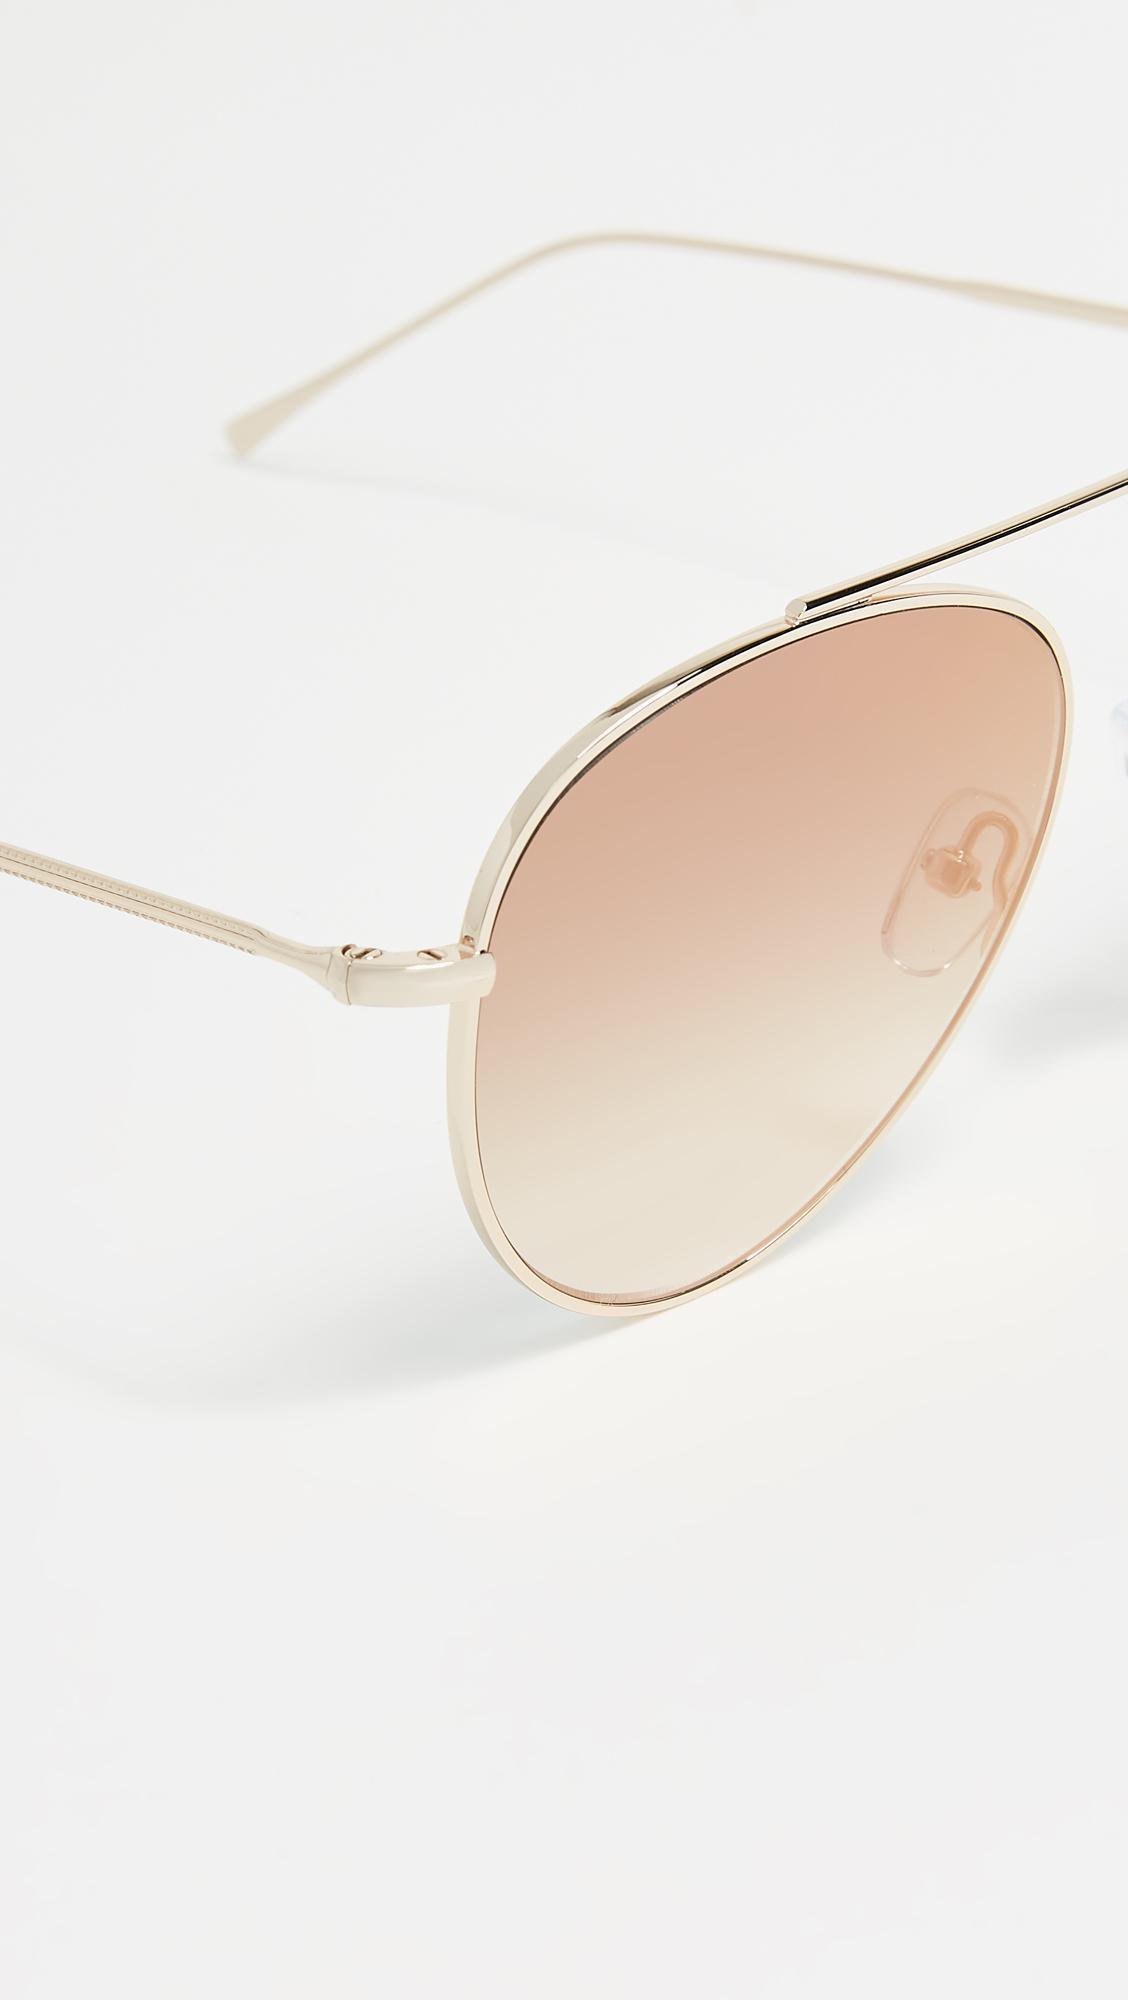 Illesteva Dorchester Gradient Mirrored Sunglasses in Gold/Gold (Metallic)